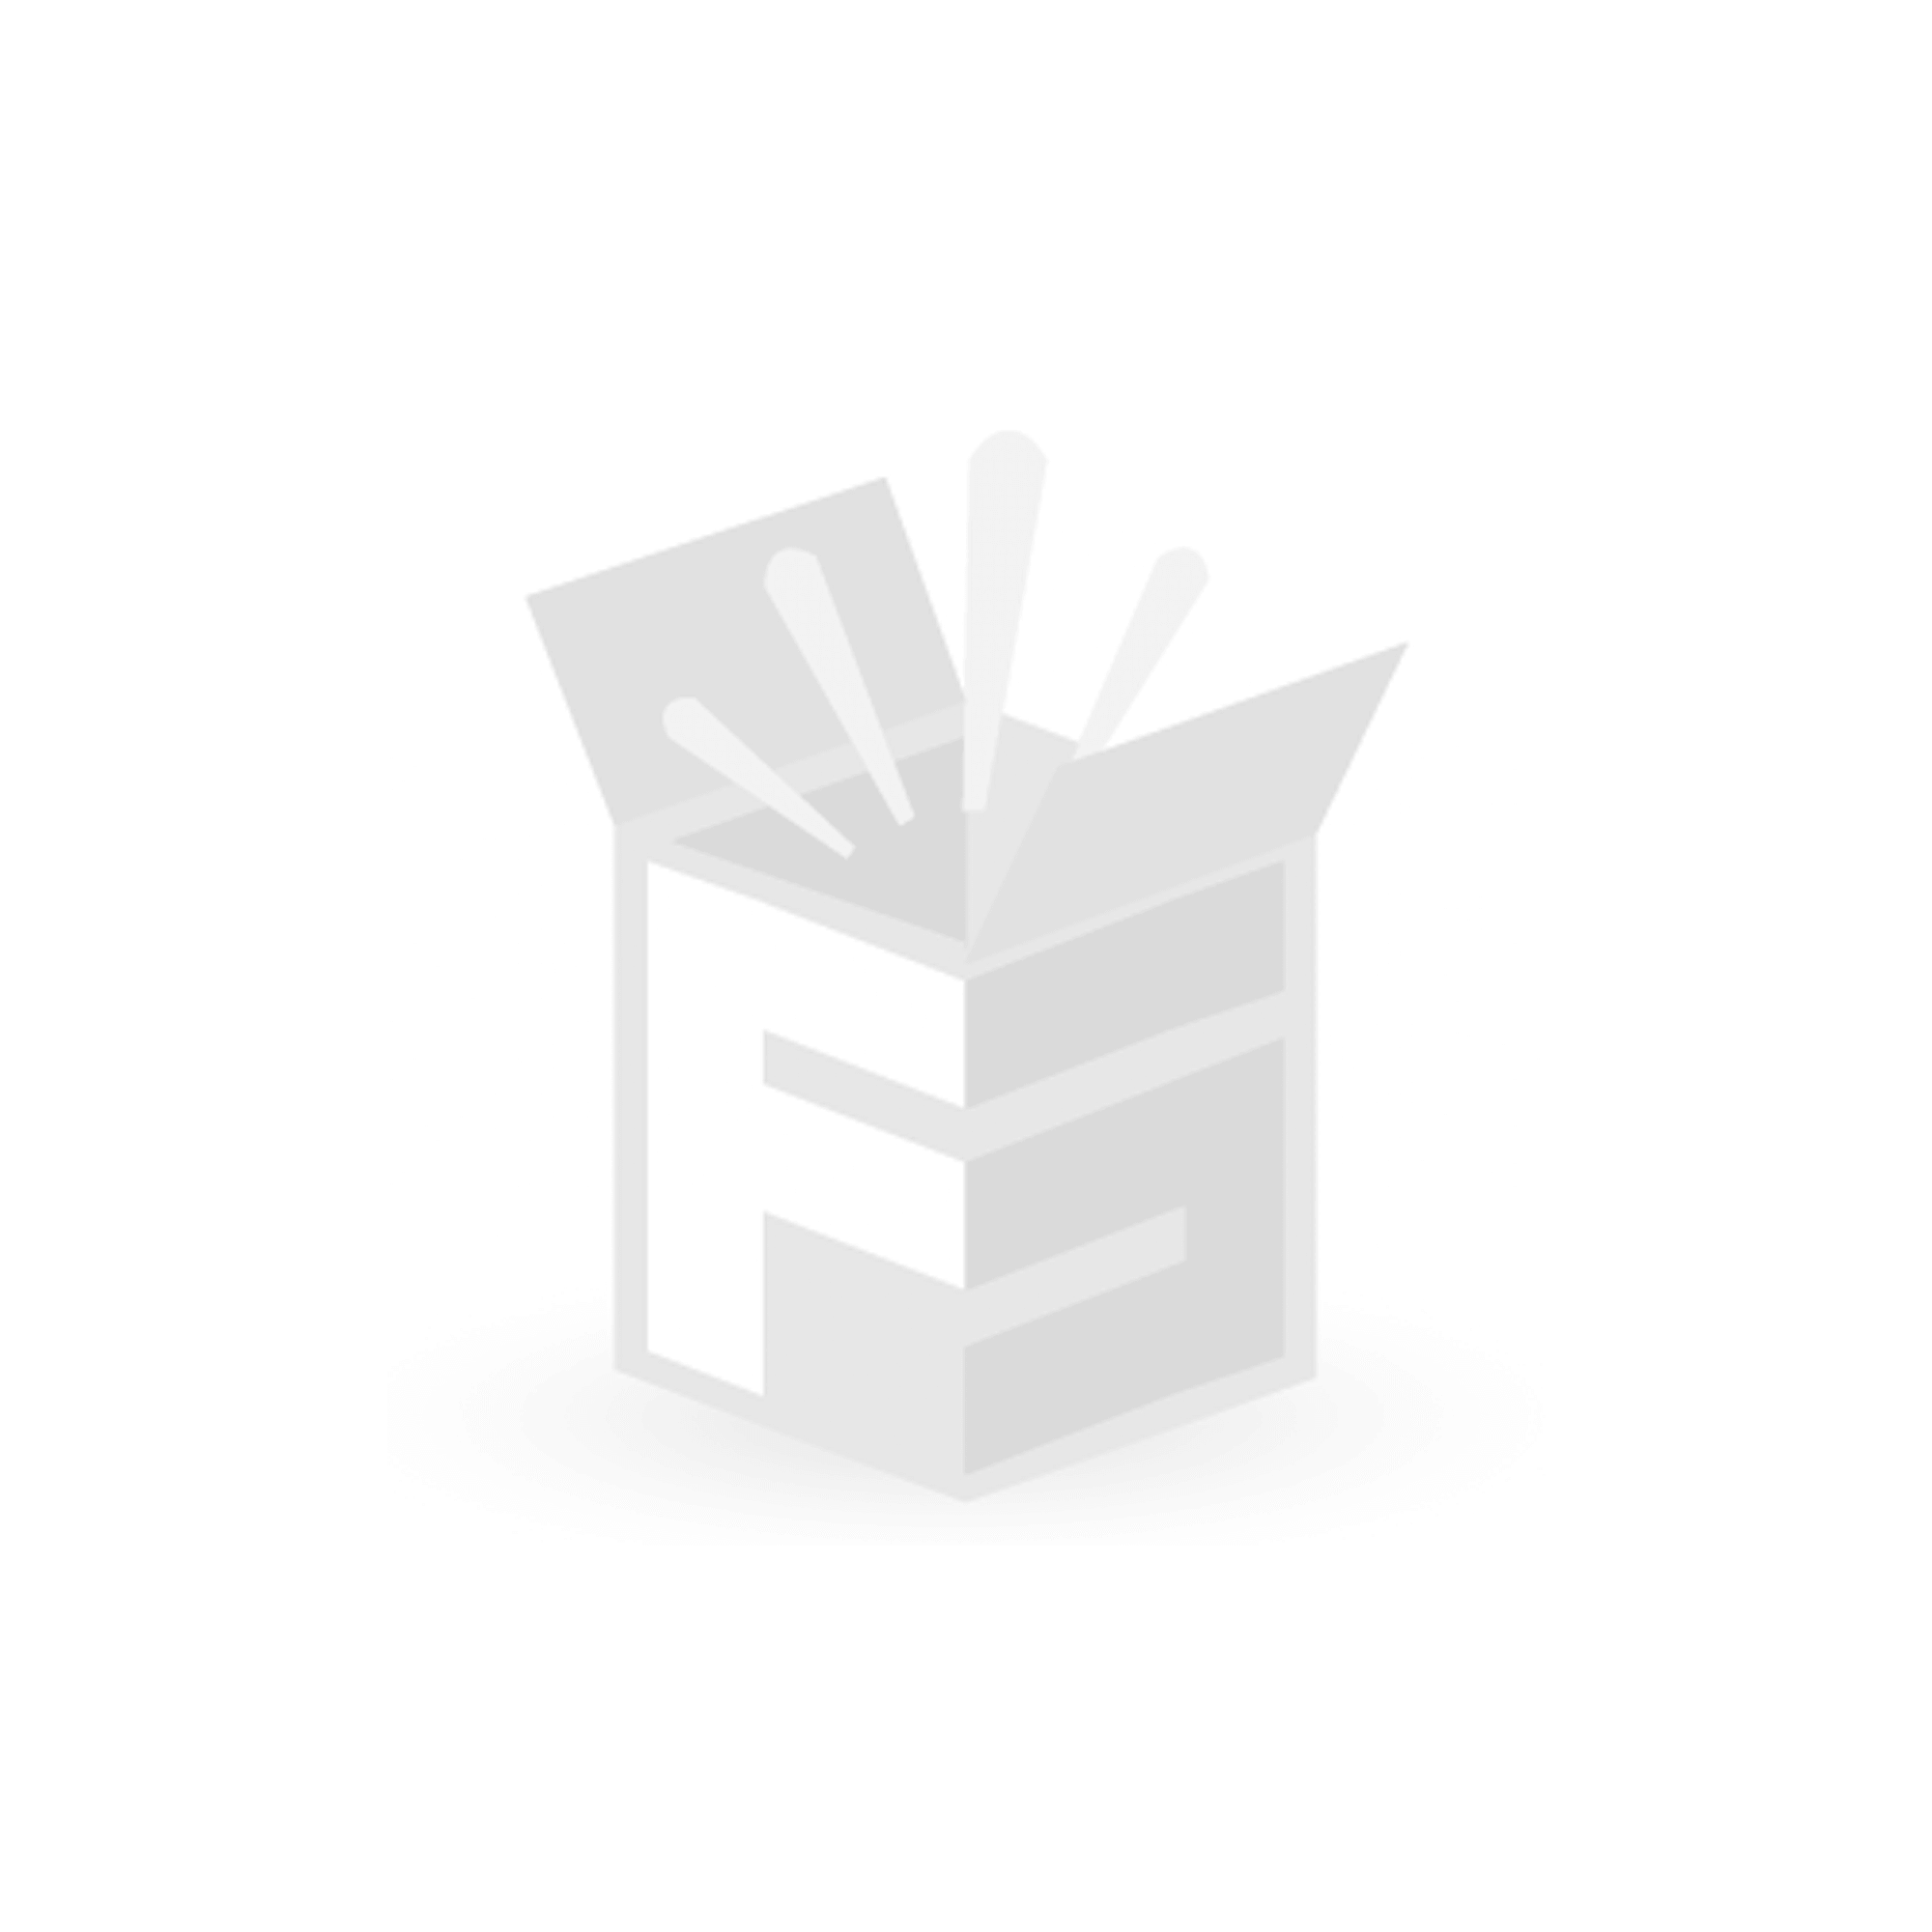 Kibernetik Serre-câbles 610 x 8.8 mm, noir, 100 pièces